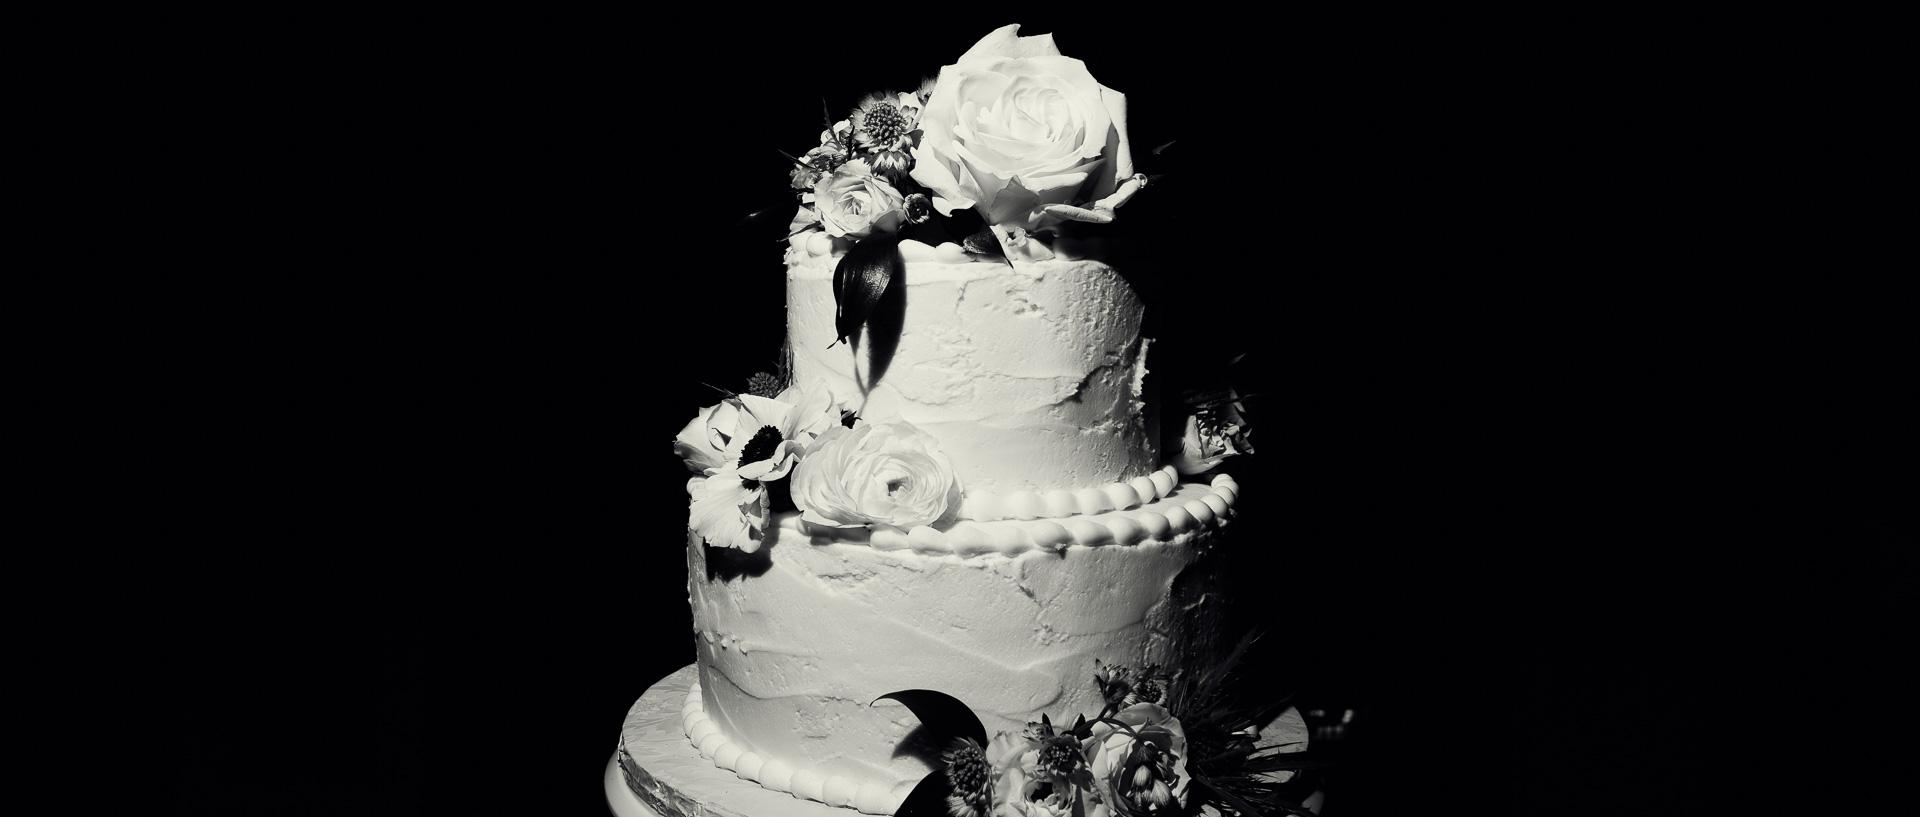 21 - wedding X - B-7010 - wide - _MG_2323.jpg